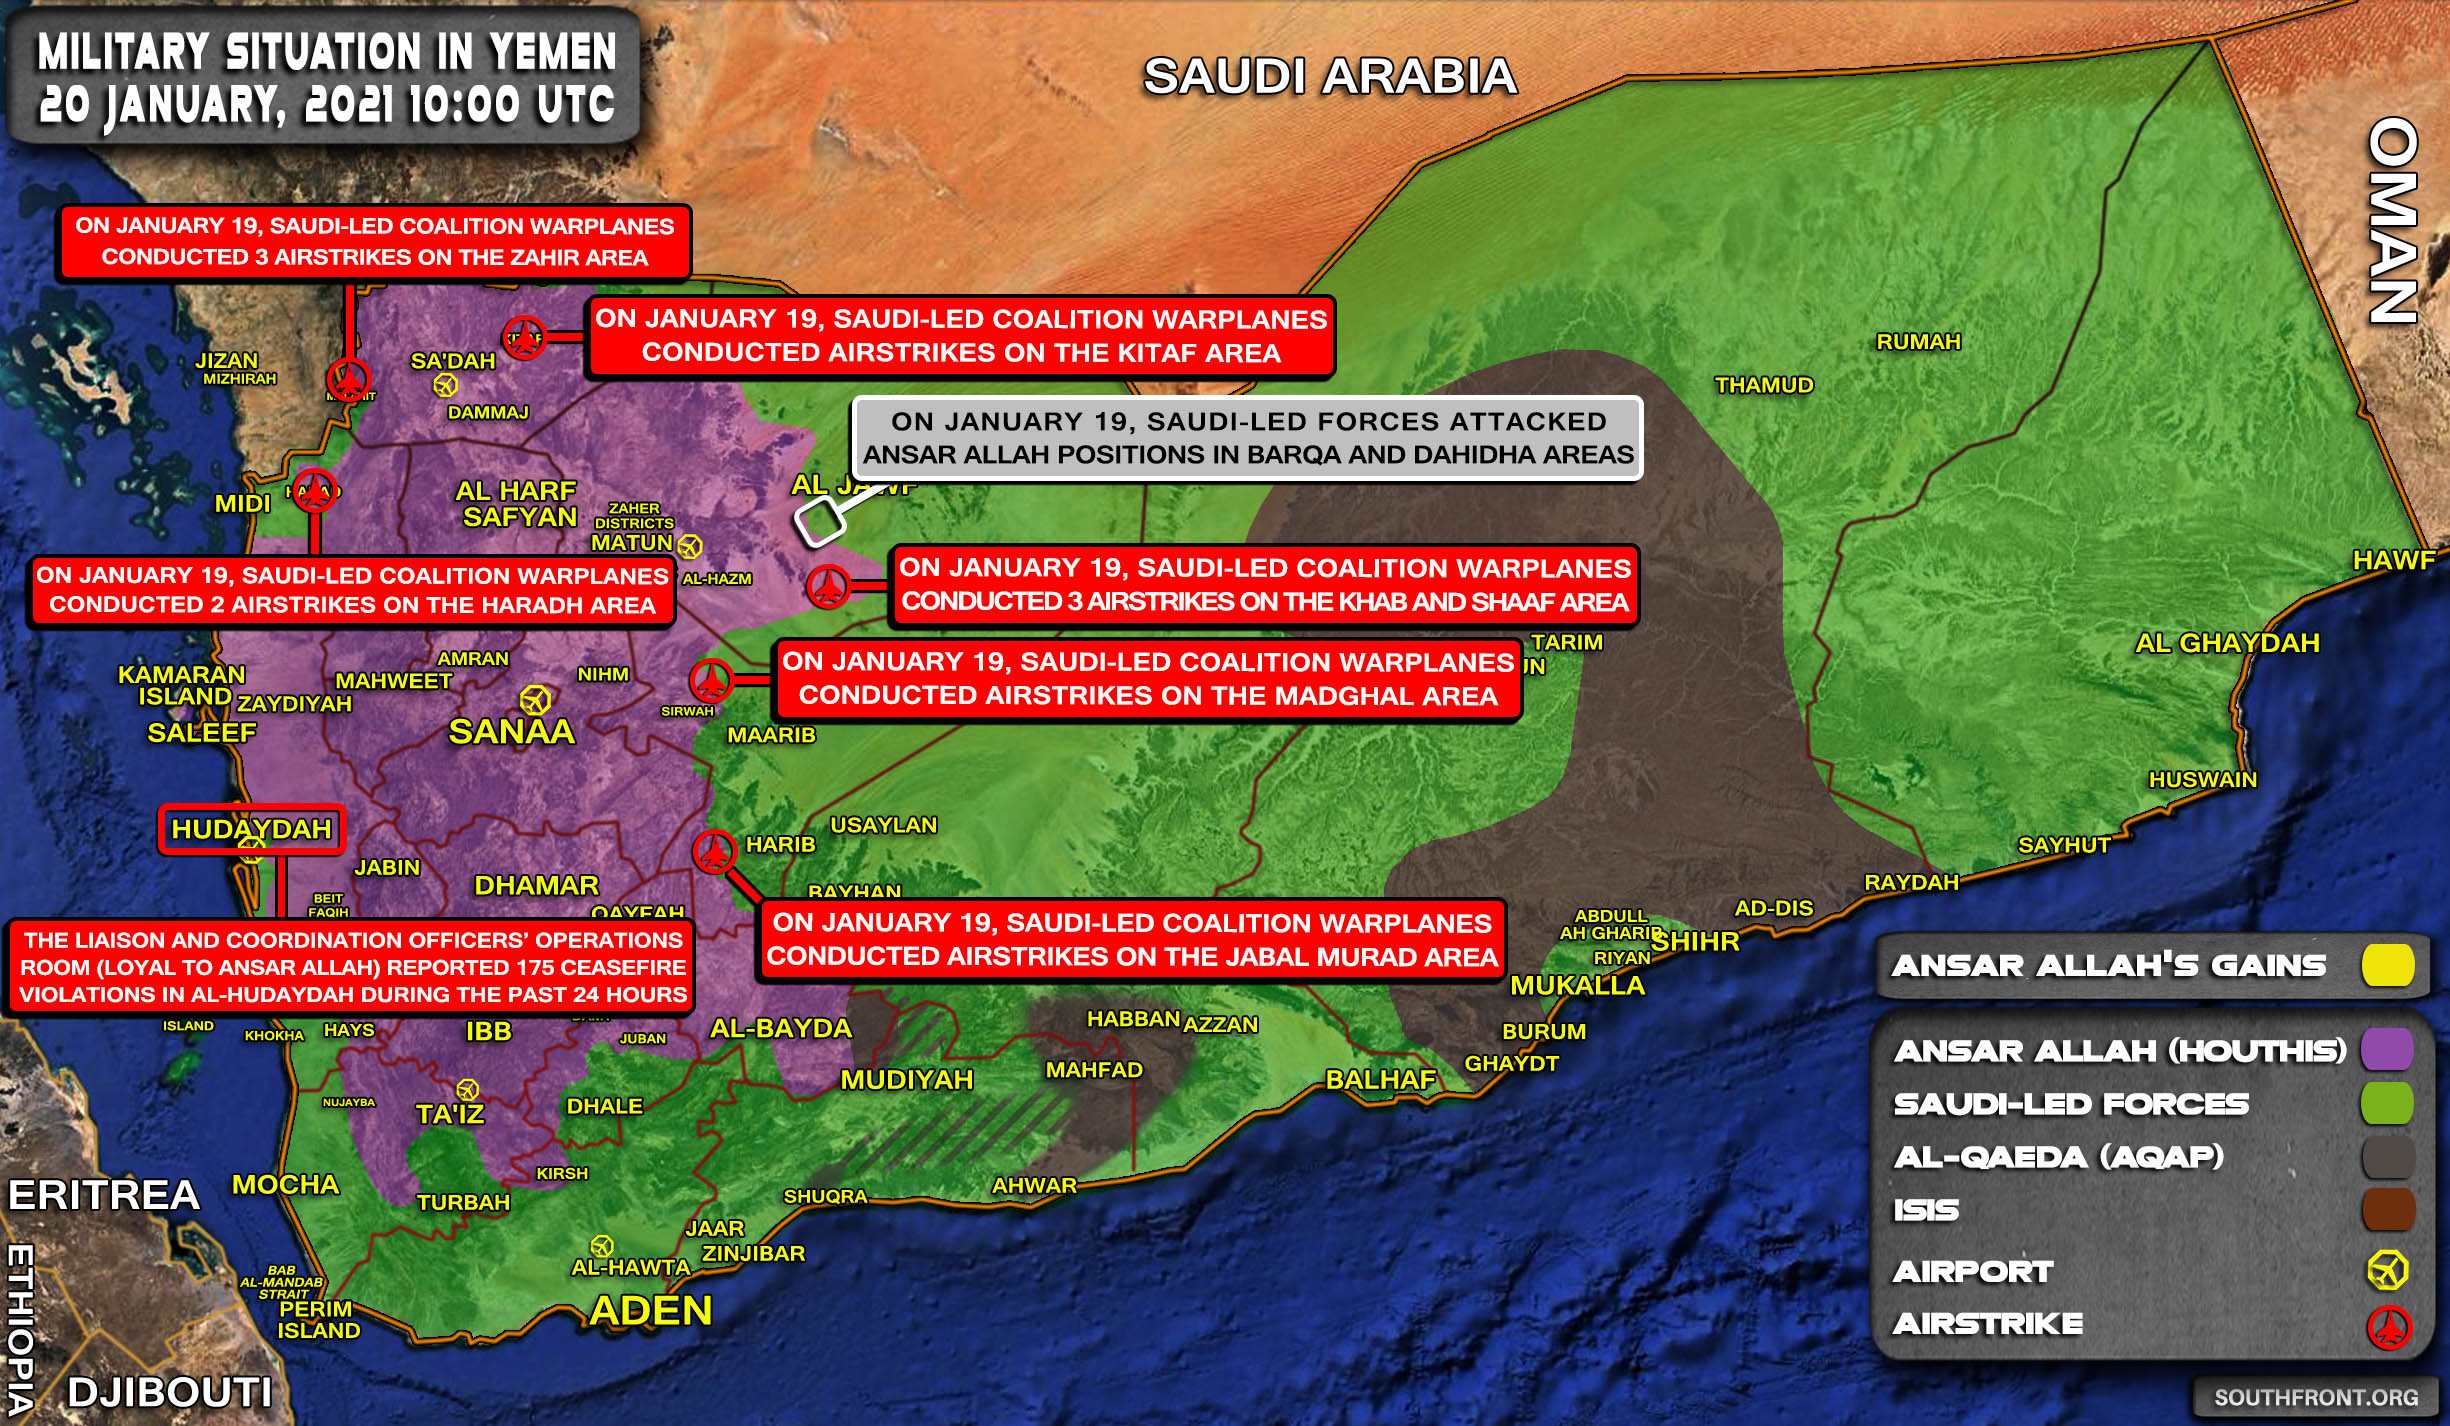 Saudi-Backed Forces Ambushed Houthi Fighters In Yemen's Al-Bayda'